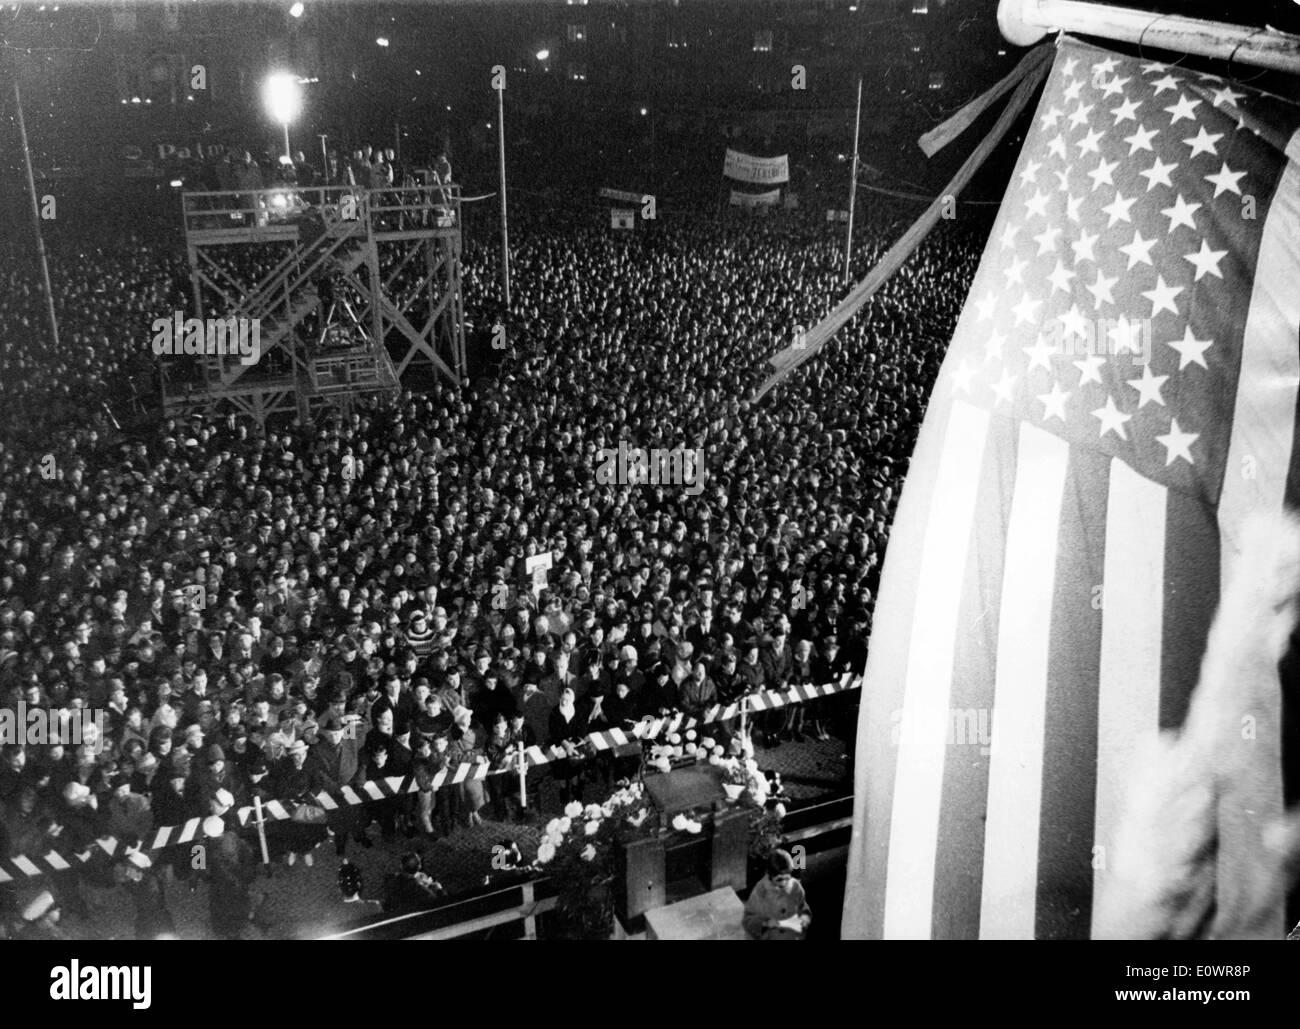 Berlin citizens honor memory of JFK - Stock Image